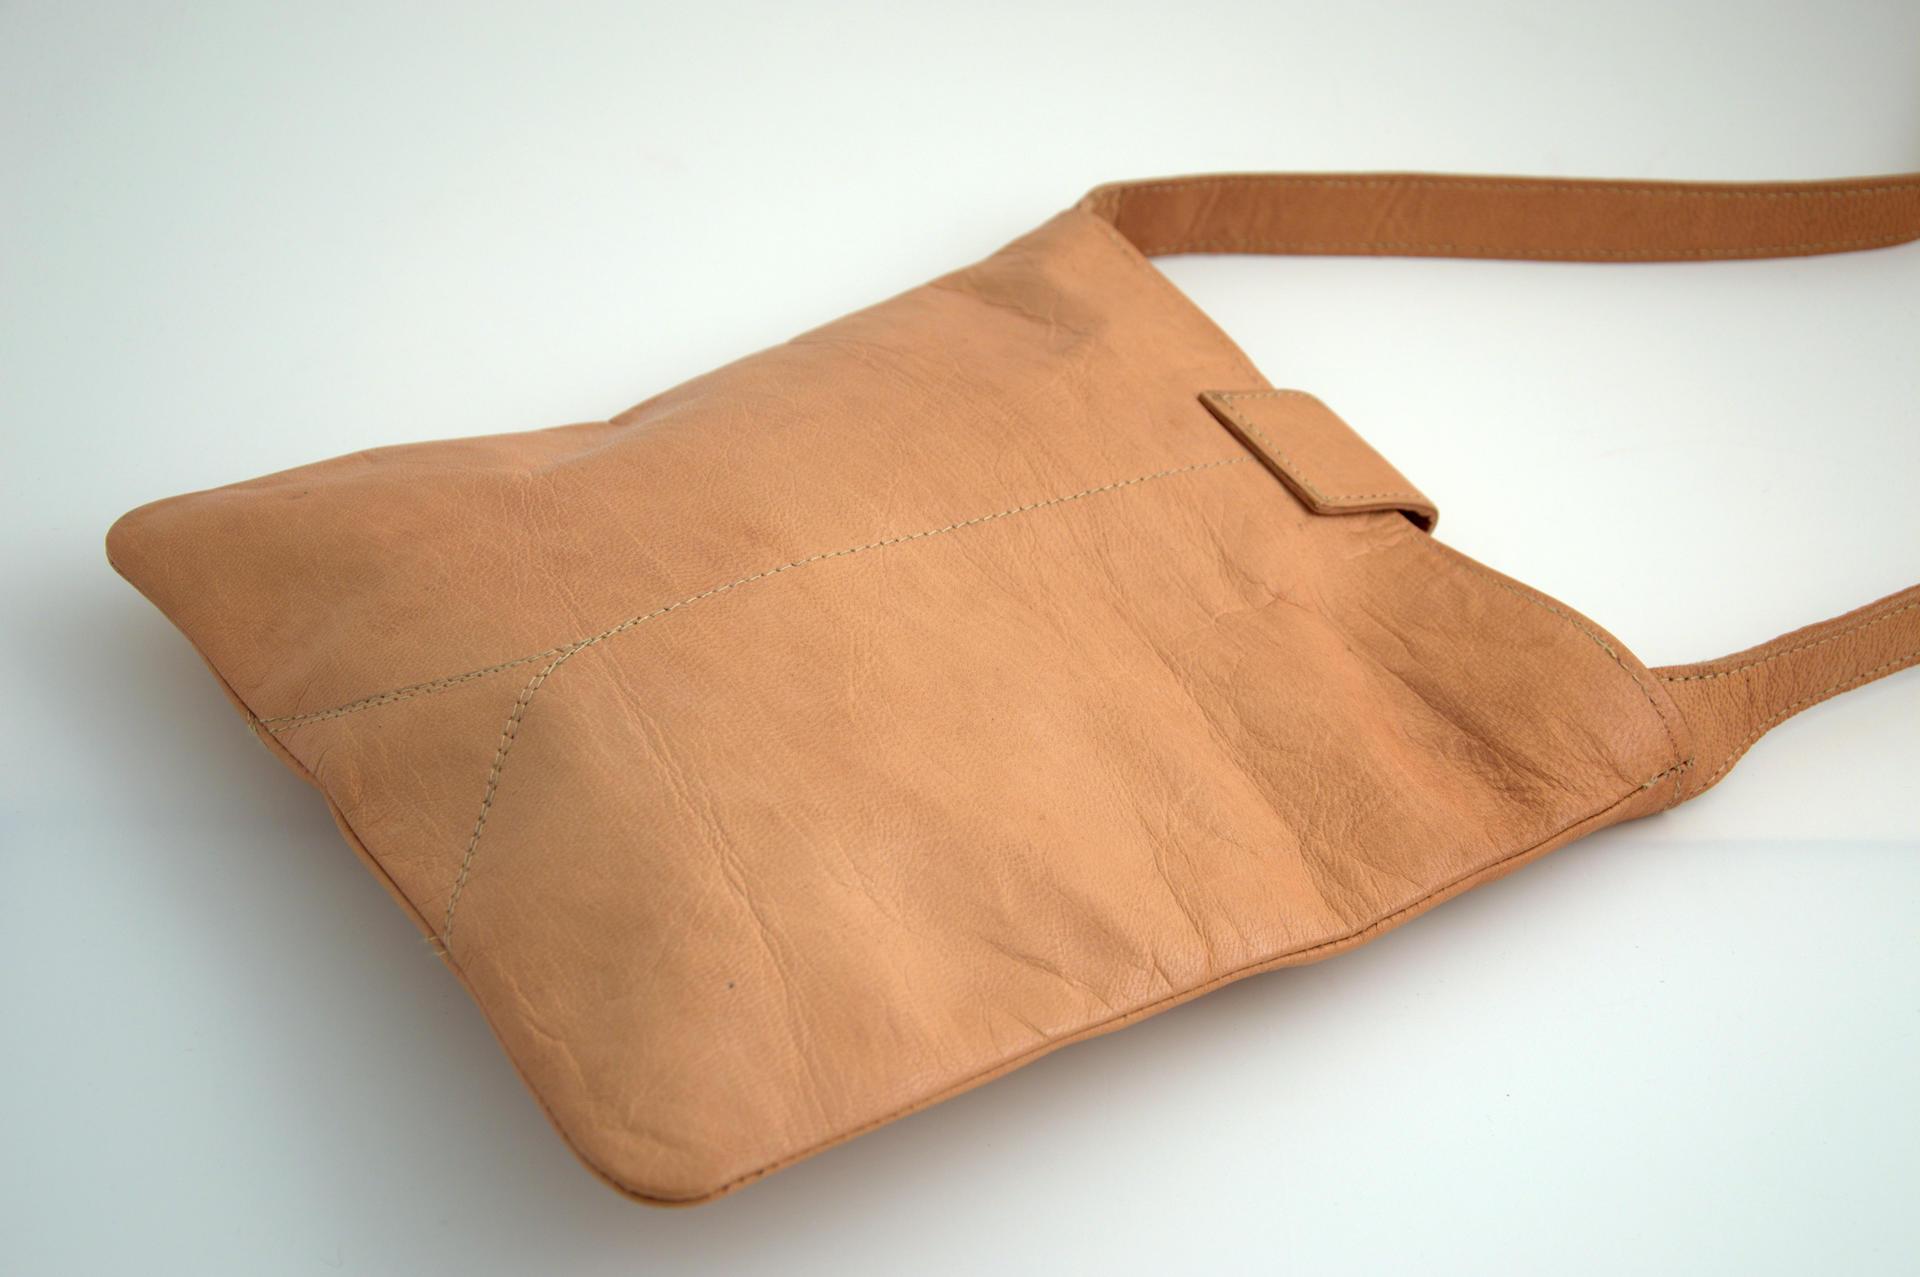 Gundara - genuine leather hand bag - fair trade from Afghanistan